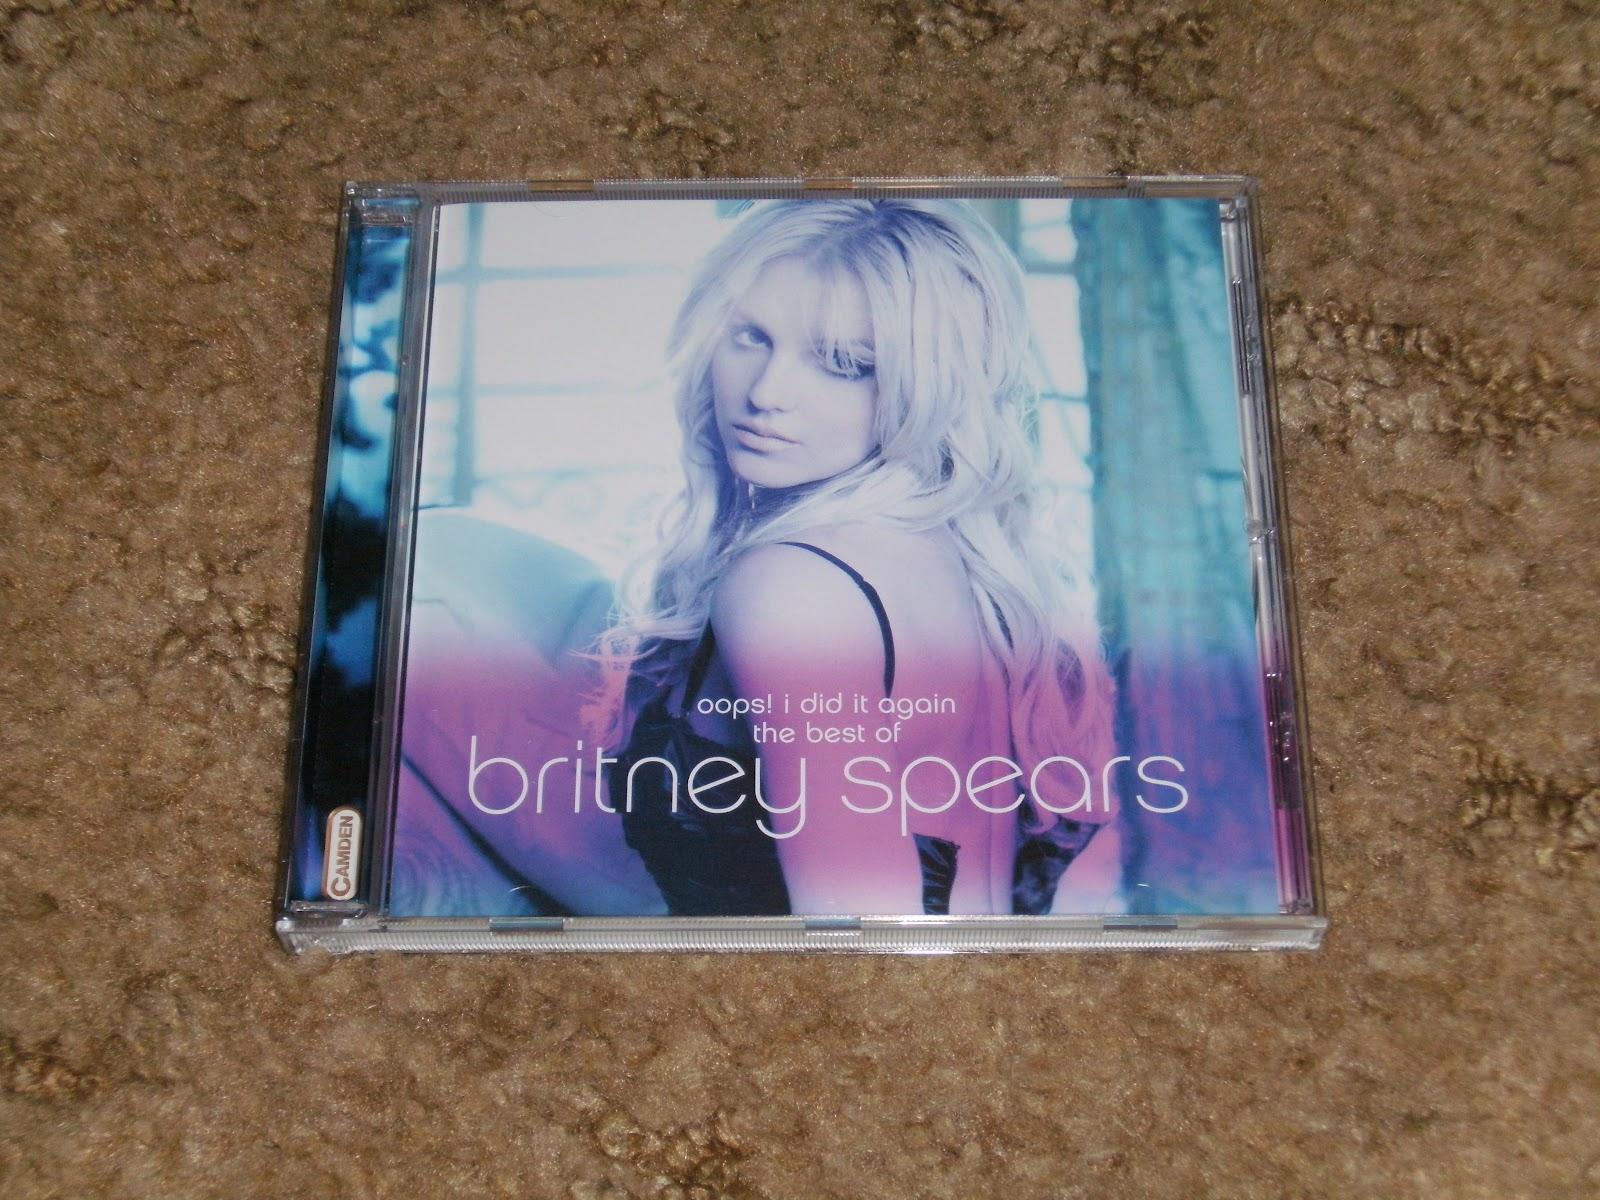 http://2.bp.blogspot.com/-YoCIf1tlUqg/UAJD1dDOy8I/AAAAAAAABE0/AoraECkiOso/s1600/Oops!...I+Did+It+Again+The+Best+of+Britney+Spears+(1).JPG